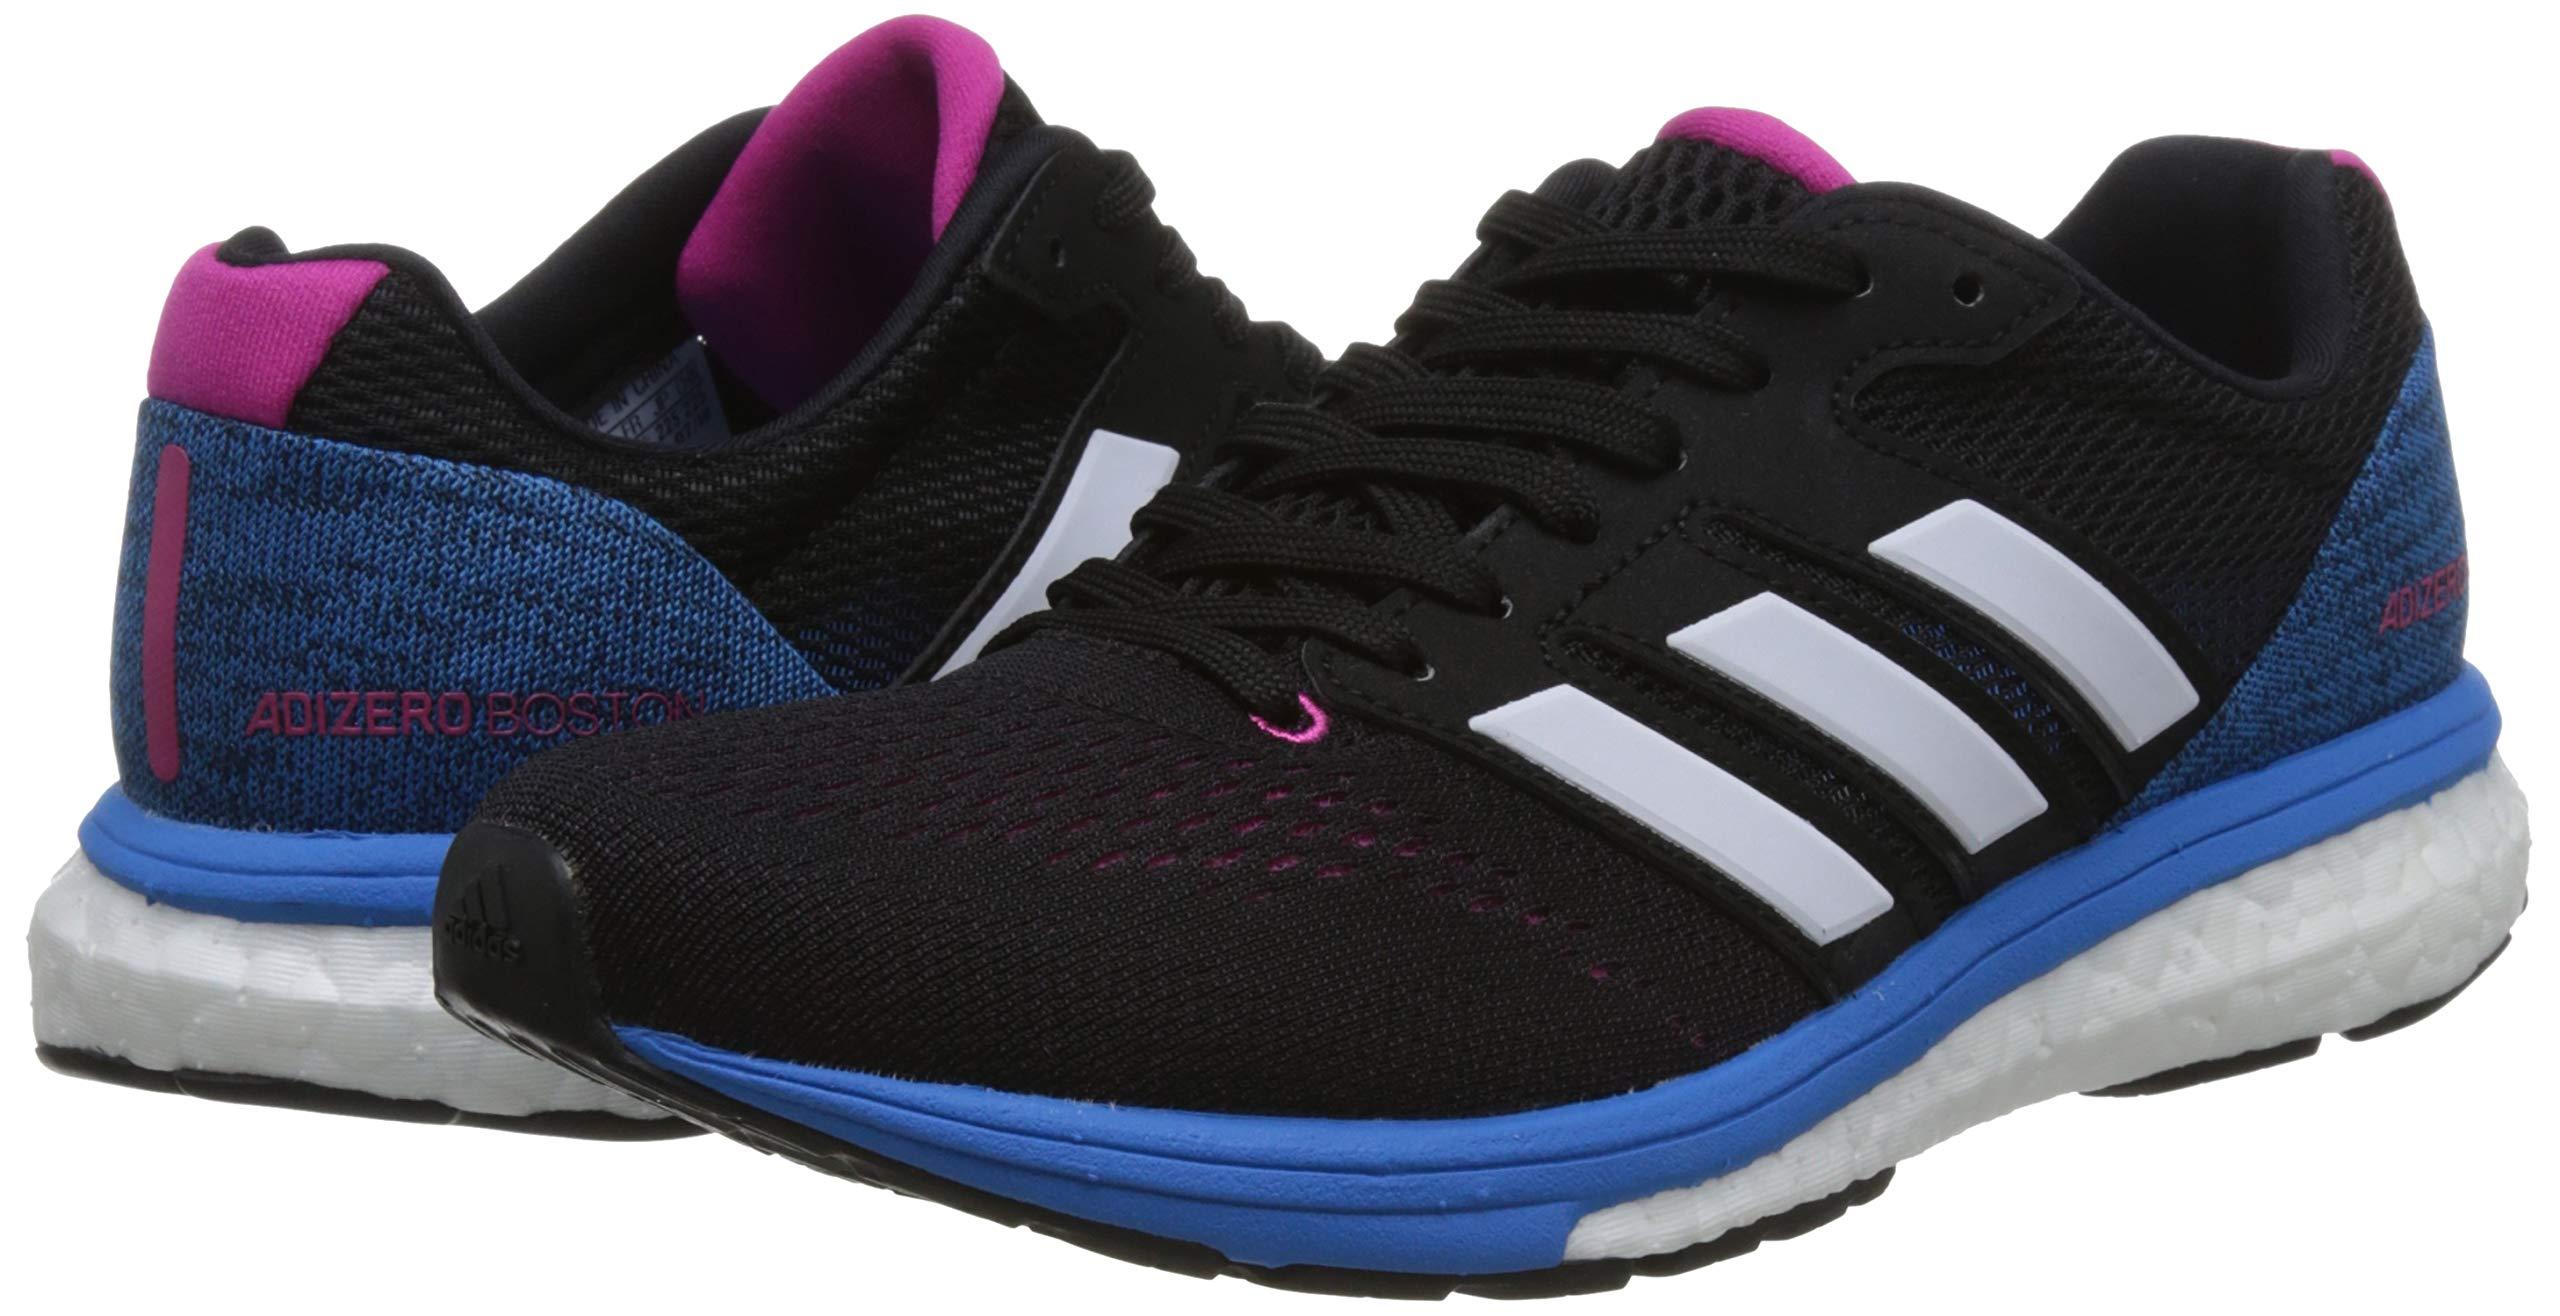 71bH pkdHTL - adidas Women's Adizero Boston 7 W Running Shoes